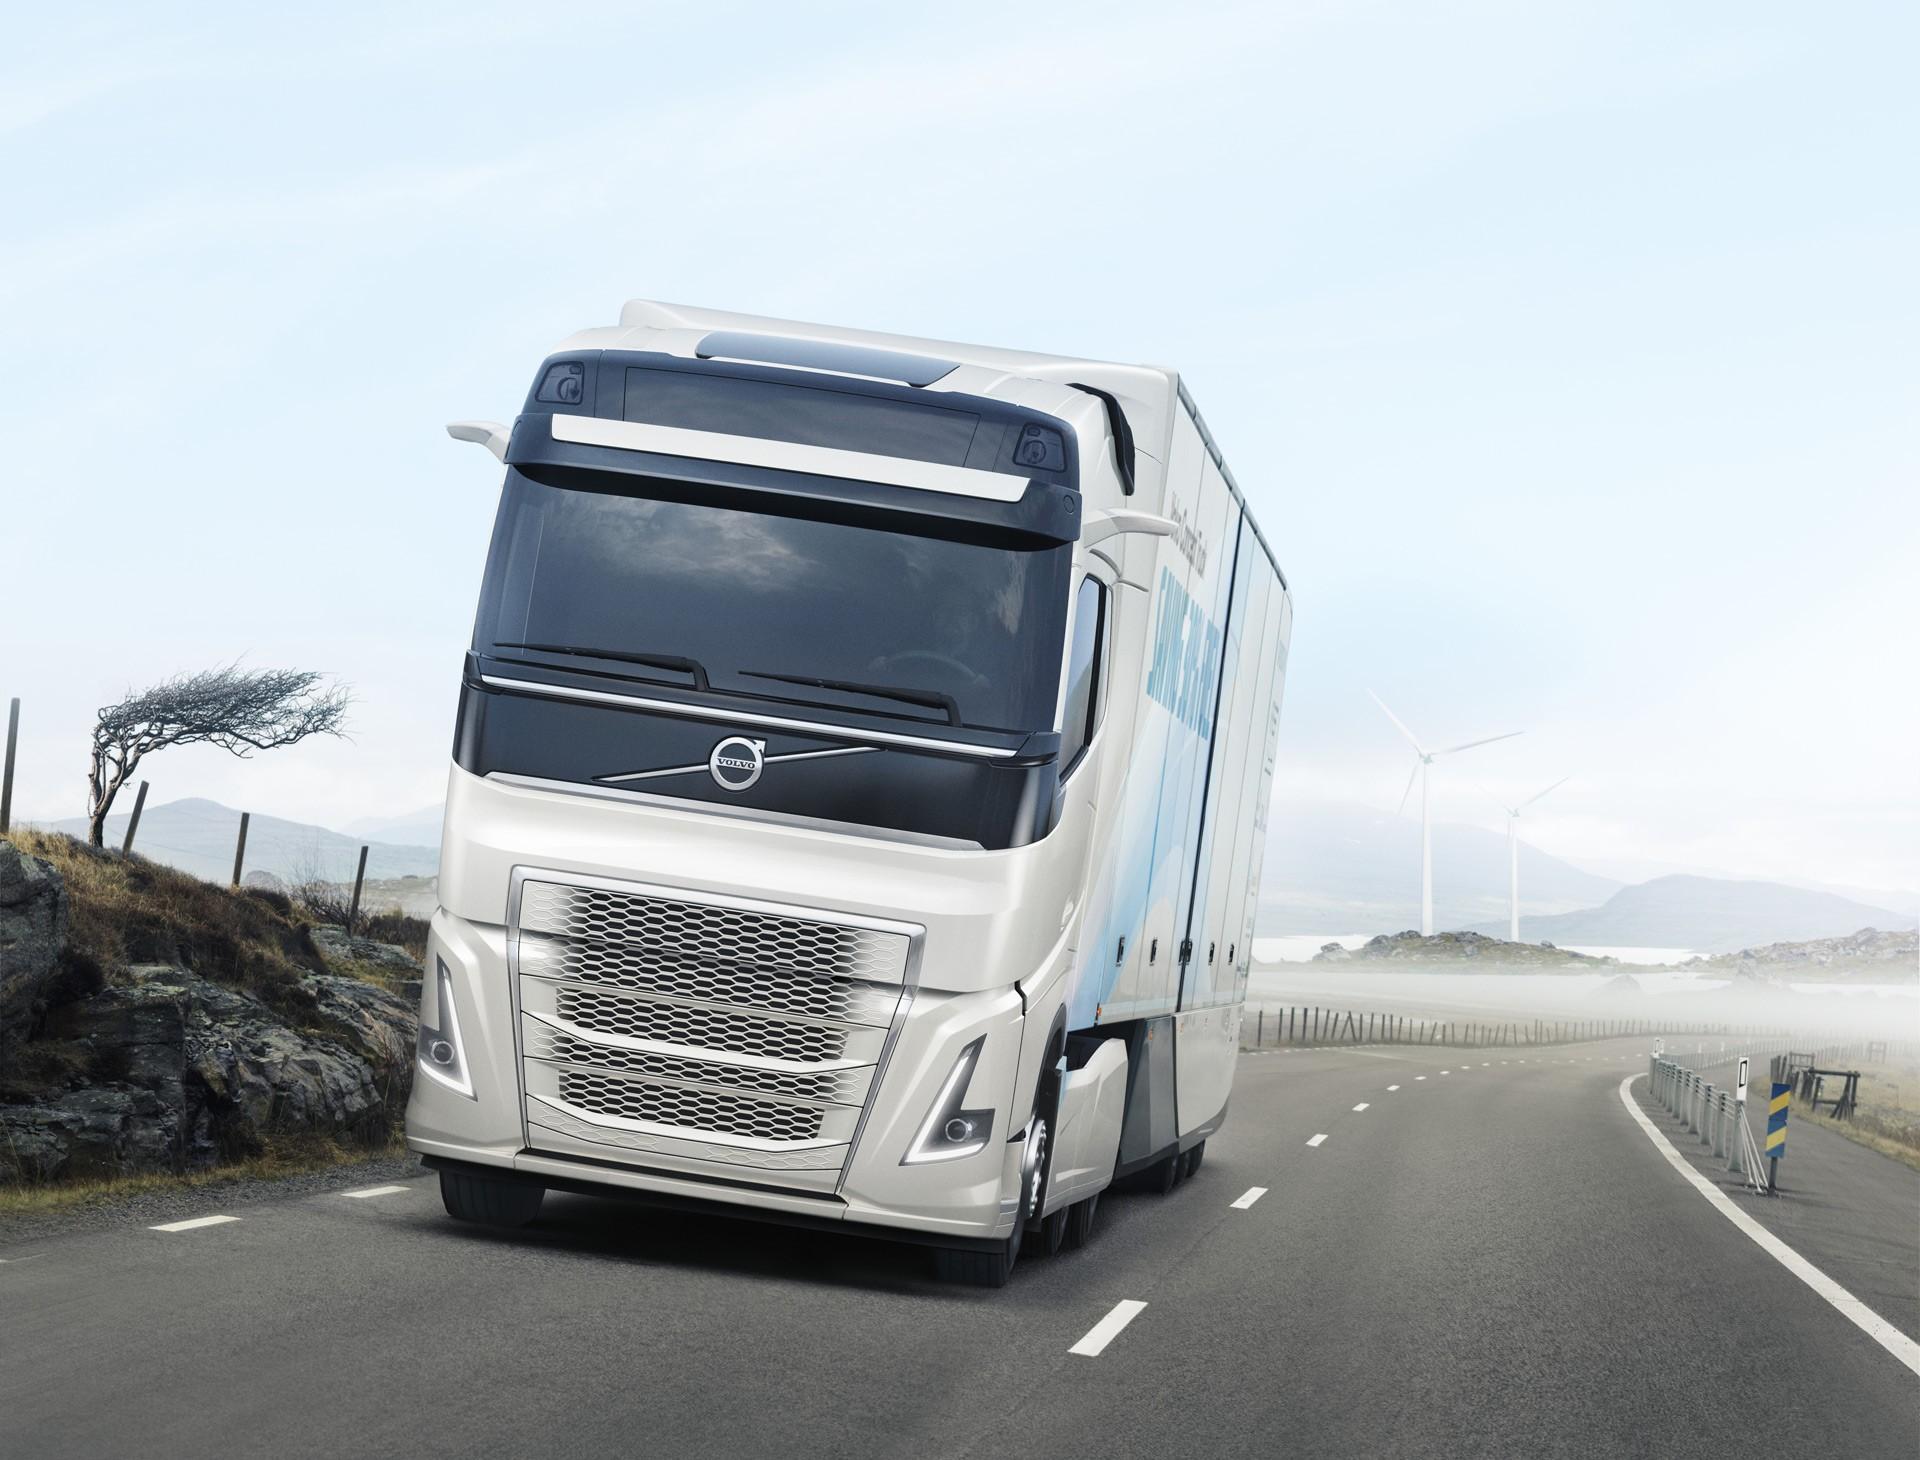 volvo trucks unveils hybrid powertrain for heavy duty truck it has an ev mode autoevolution. Black Bedroom Furniture Sets. Home Design Ideas